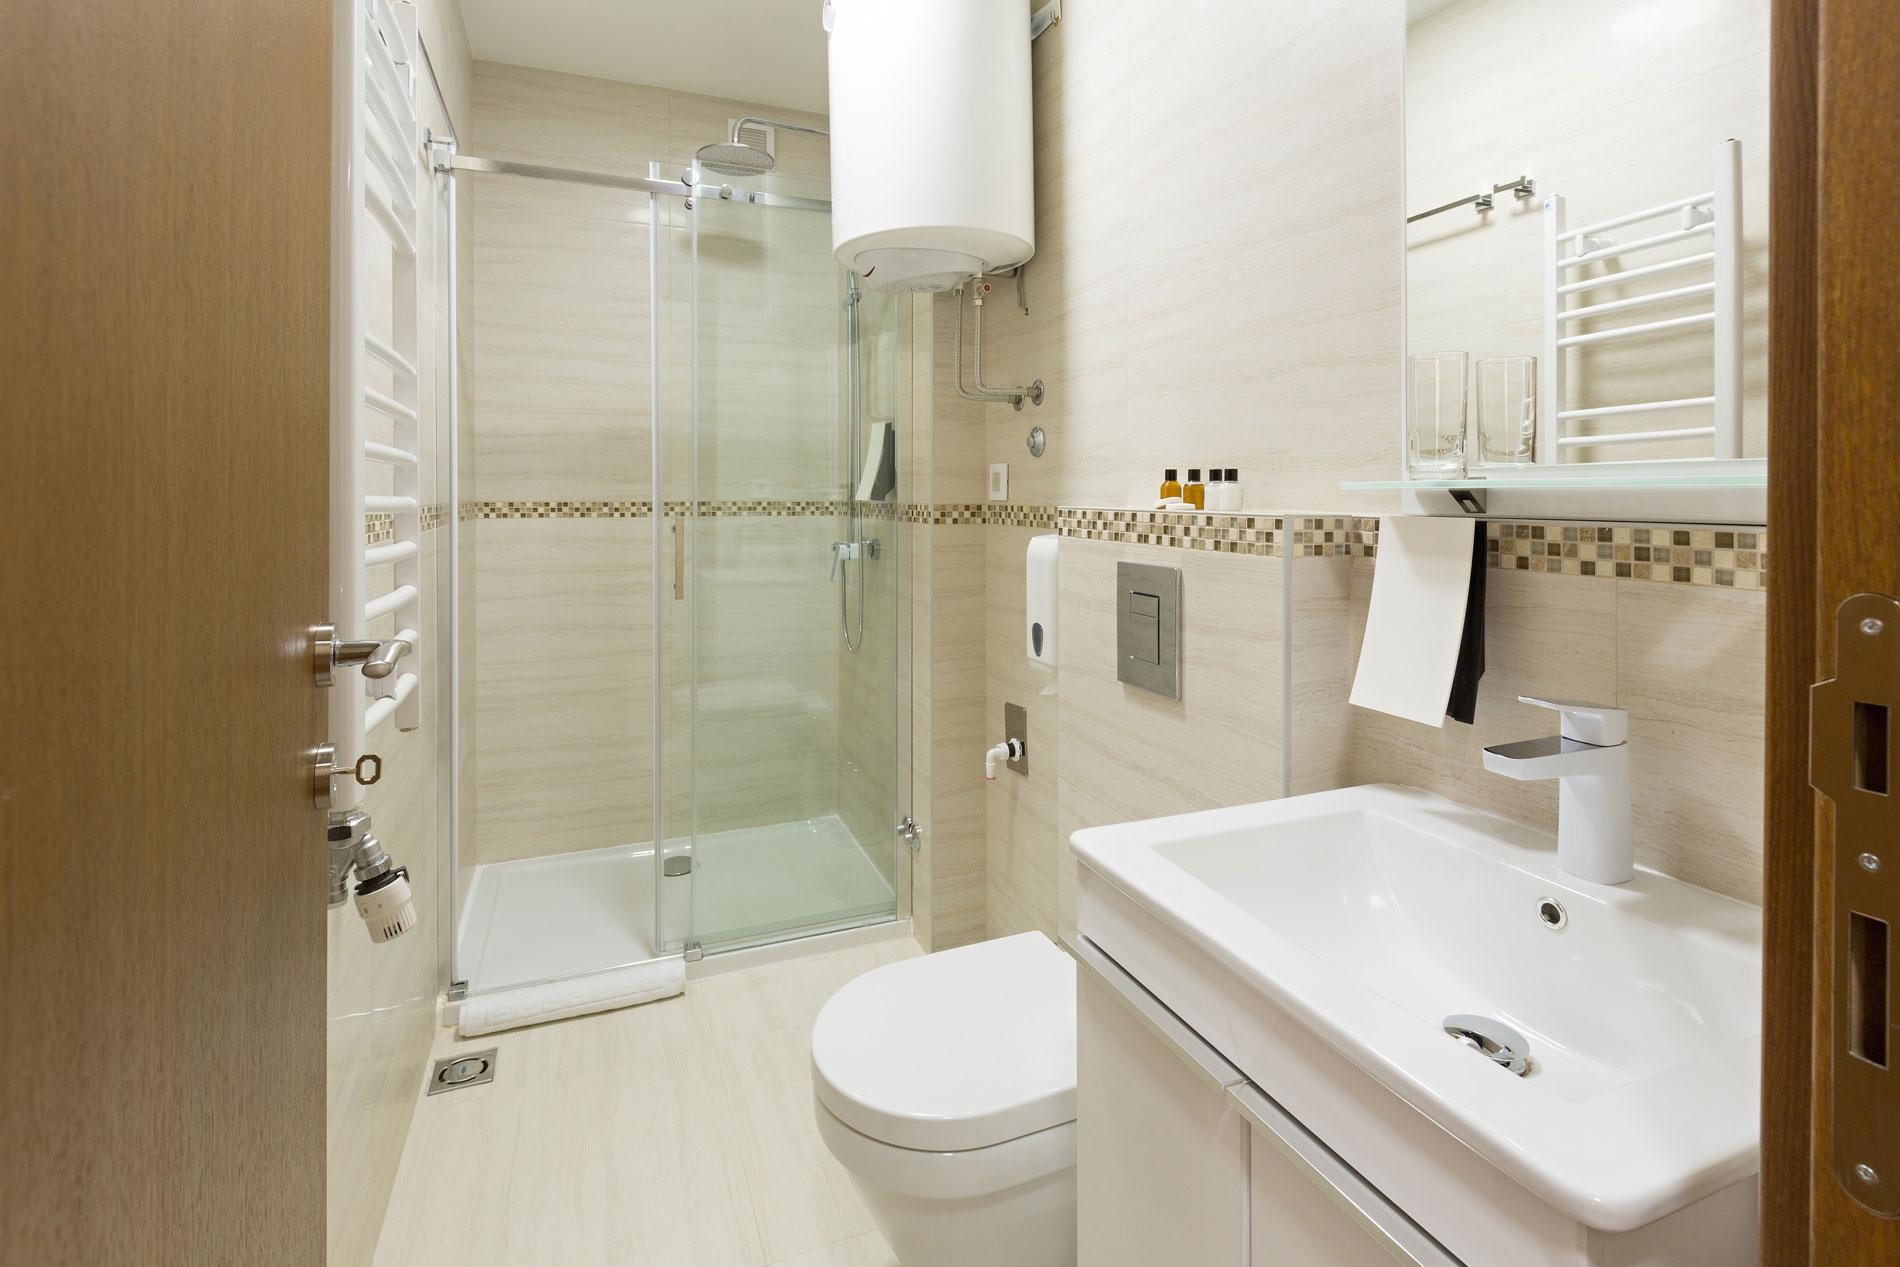 Otel Tipi Banyo Ekipmanları